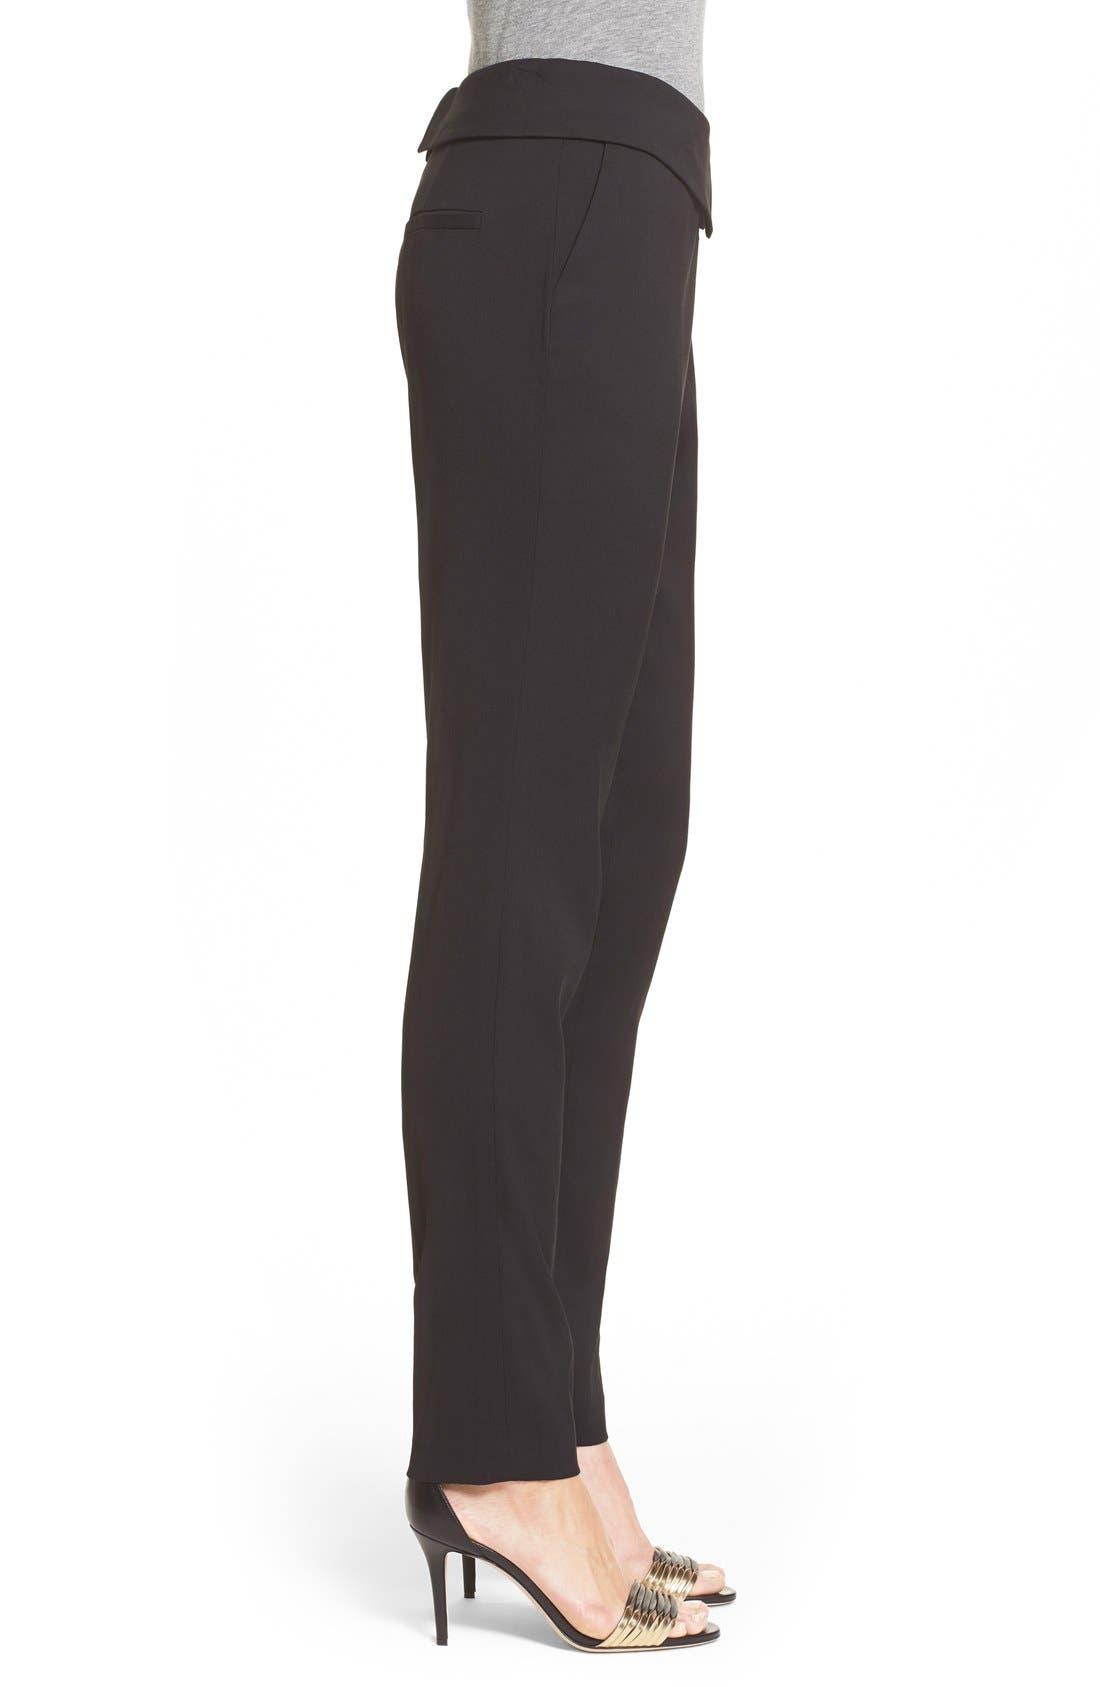 'Delray' Foldover Trousers,                             Alternate thumbnail 2, color,